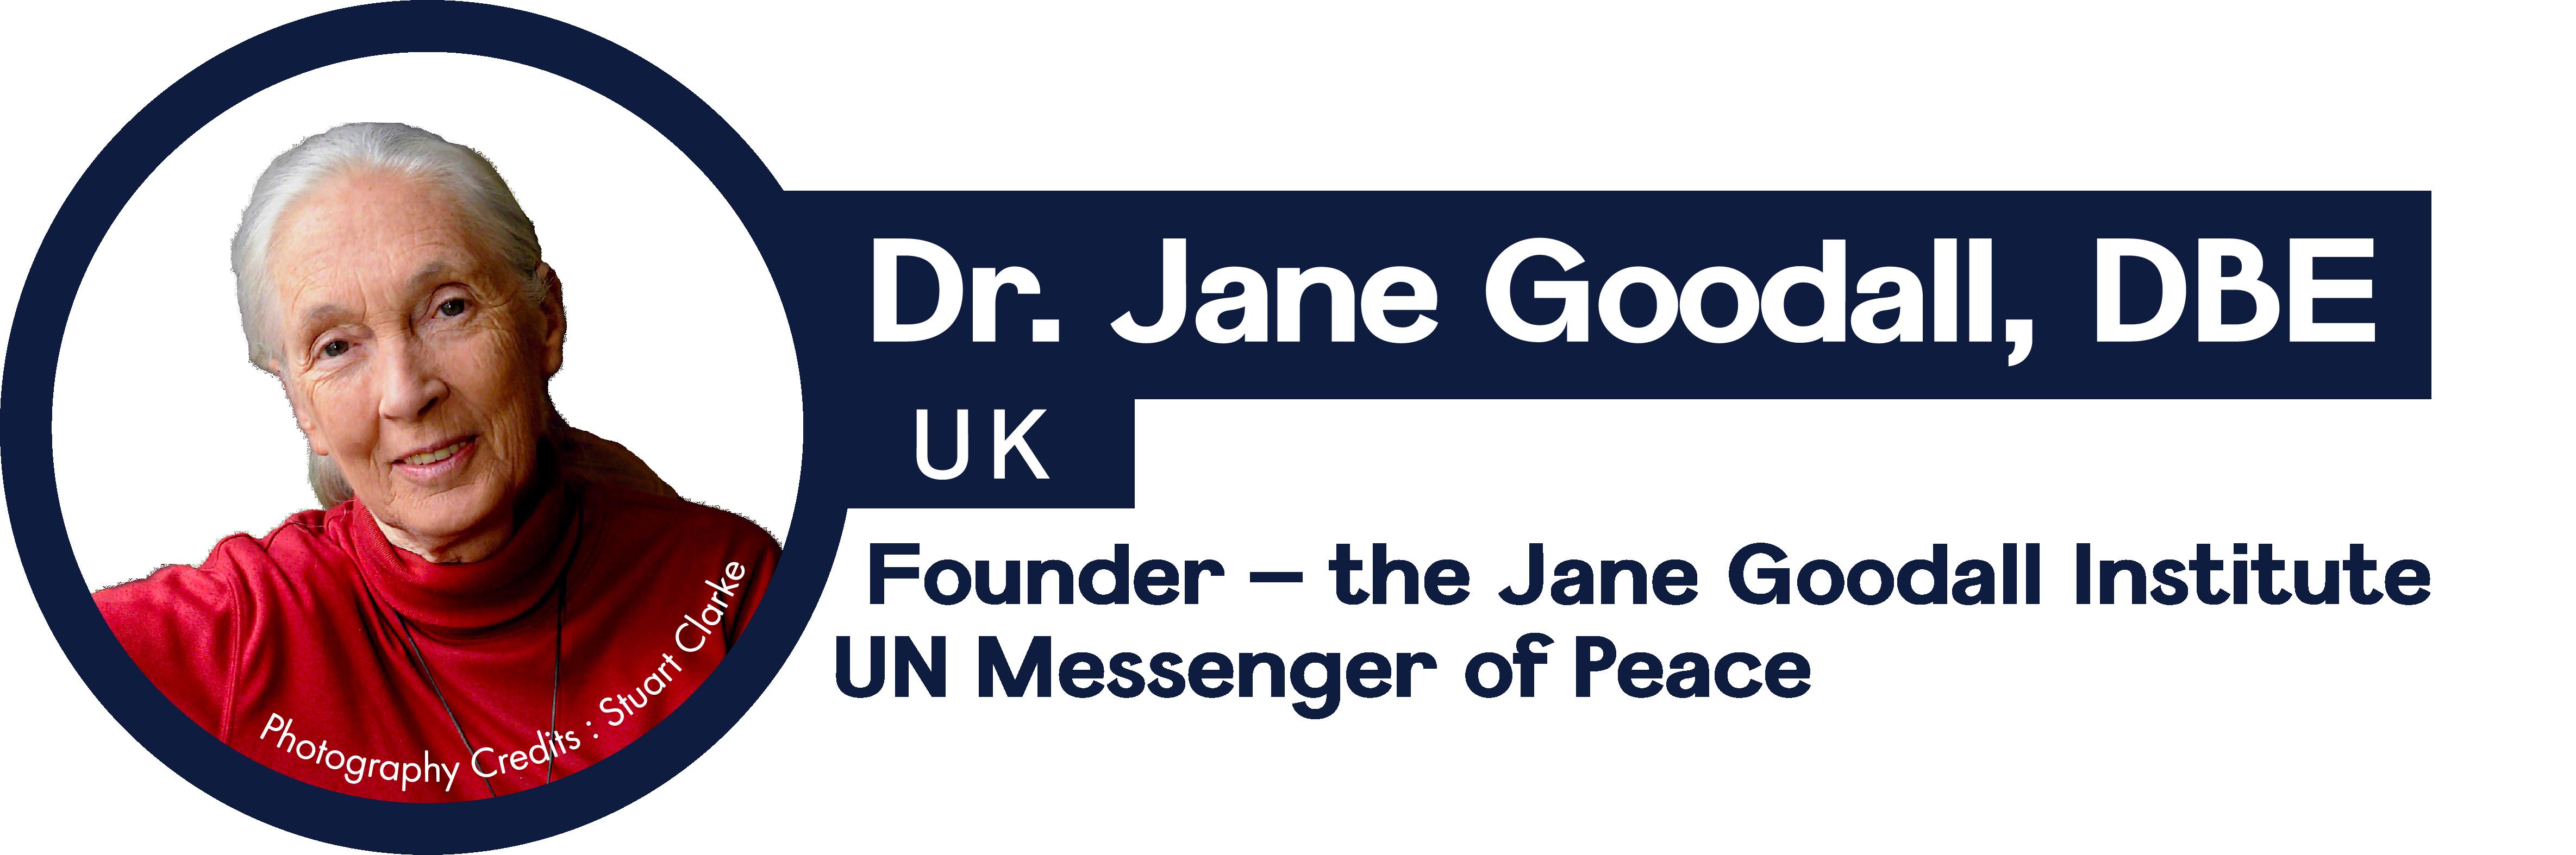 Dr. Jane Goodall, DBE_2